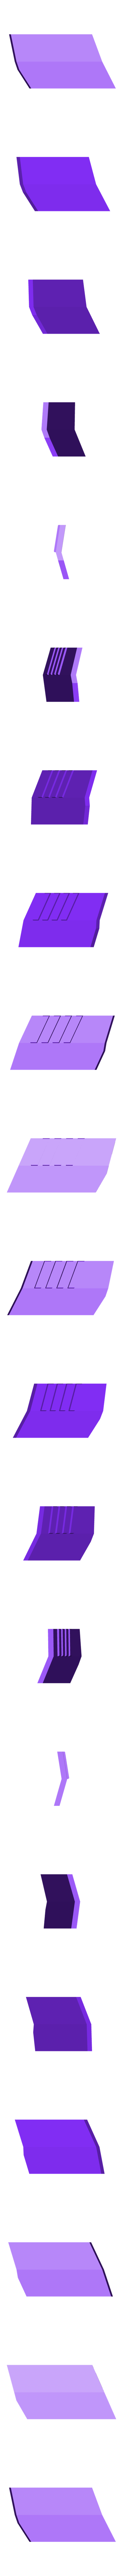 raz4.stl Download STL file Gun for a cosplay • 3D printer model, URkA